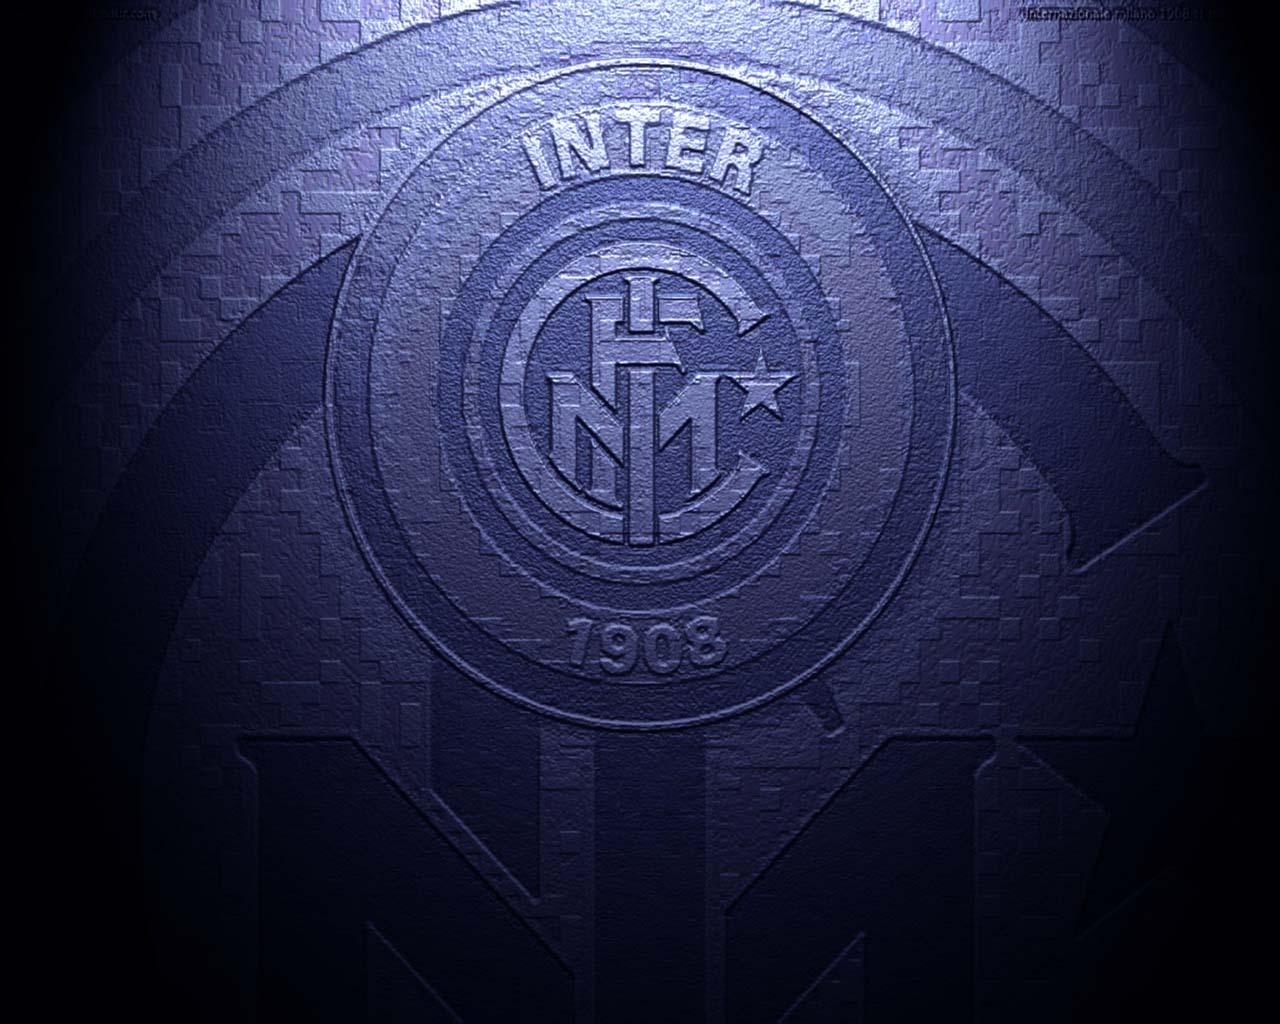 Fc Inter Milan Logo 1280x1024 Wallpaper Teahub Io